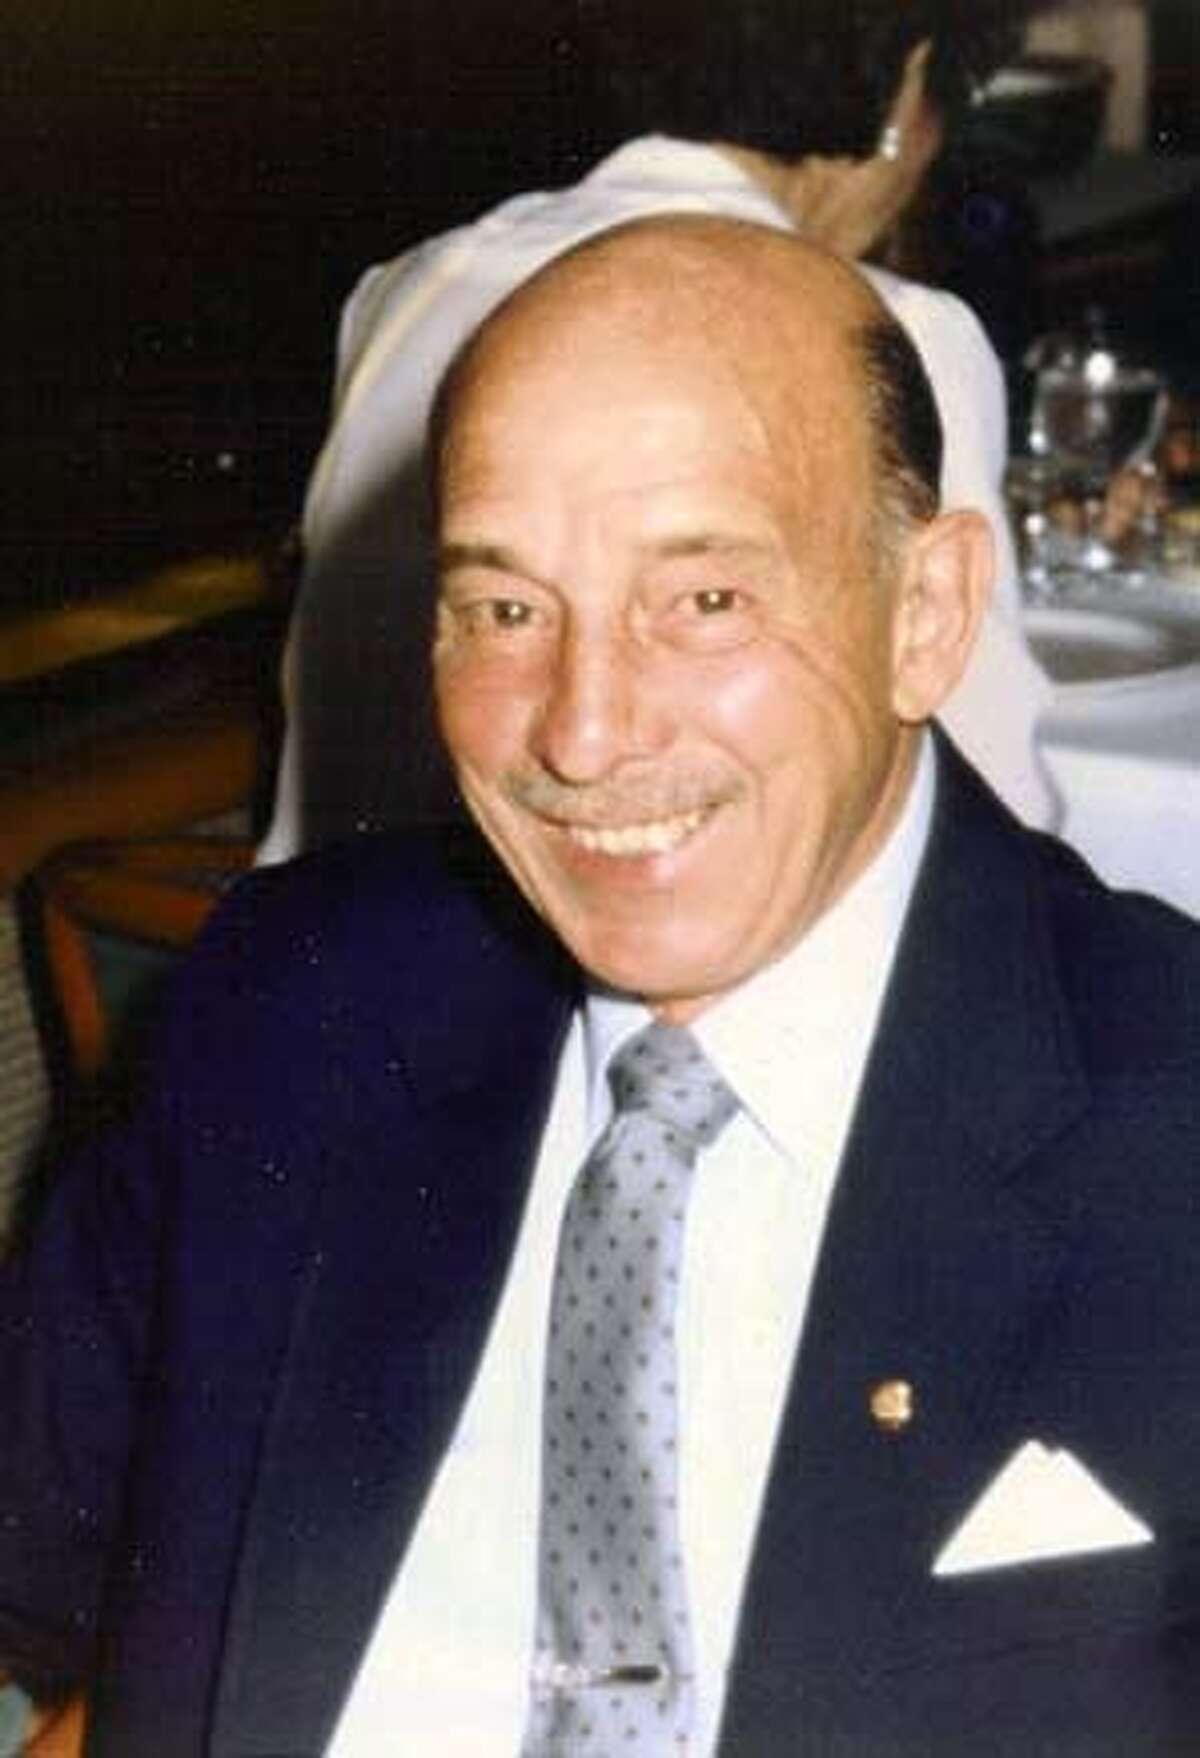 obit-andreotti.JPG Obit photo of dan andreotti handout handout